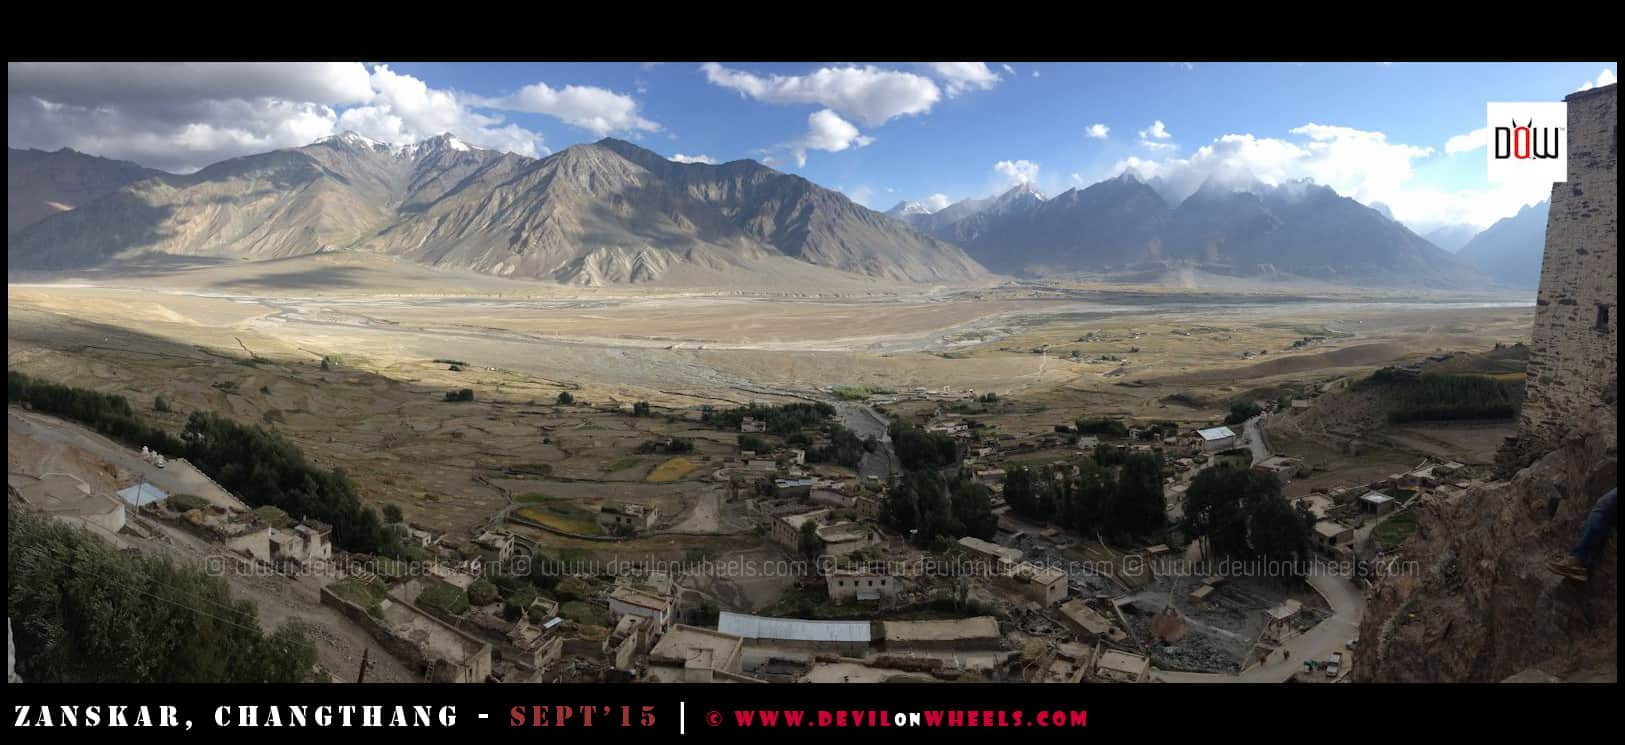 Aerial view from Karsha Monastery at Padum, Zanskar Valley